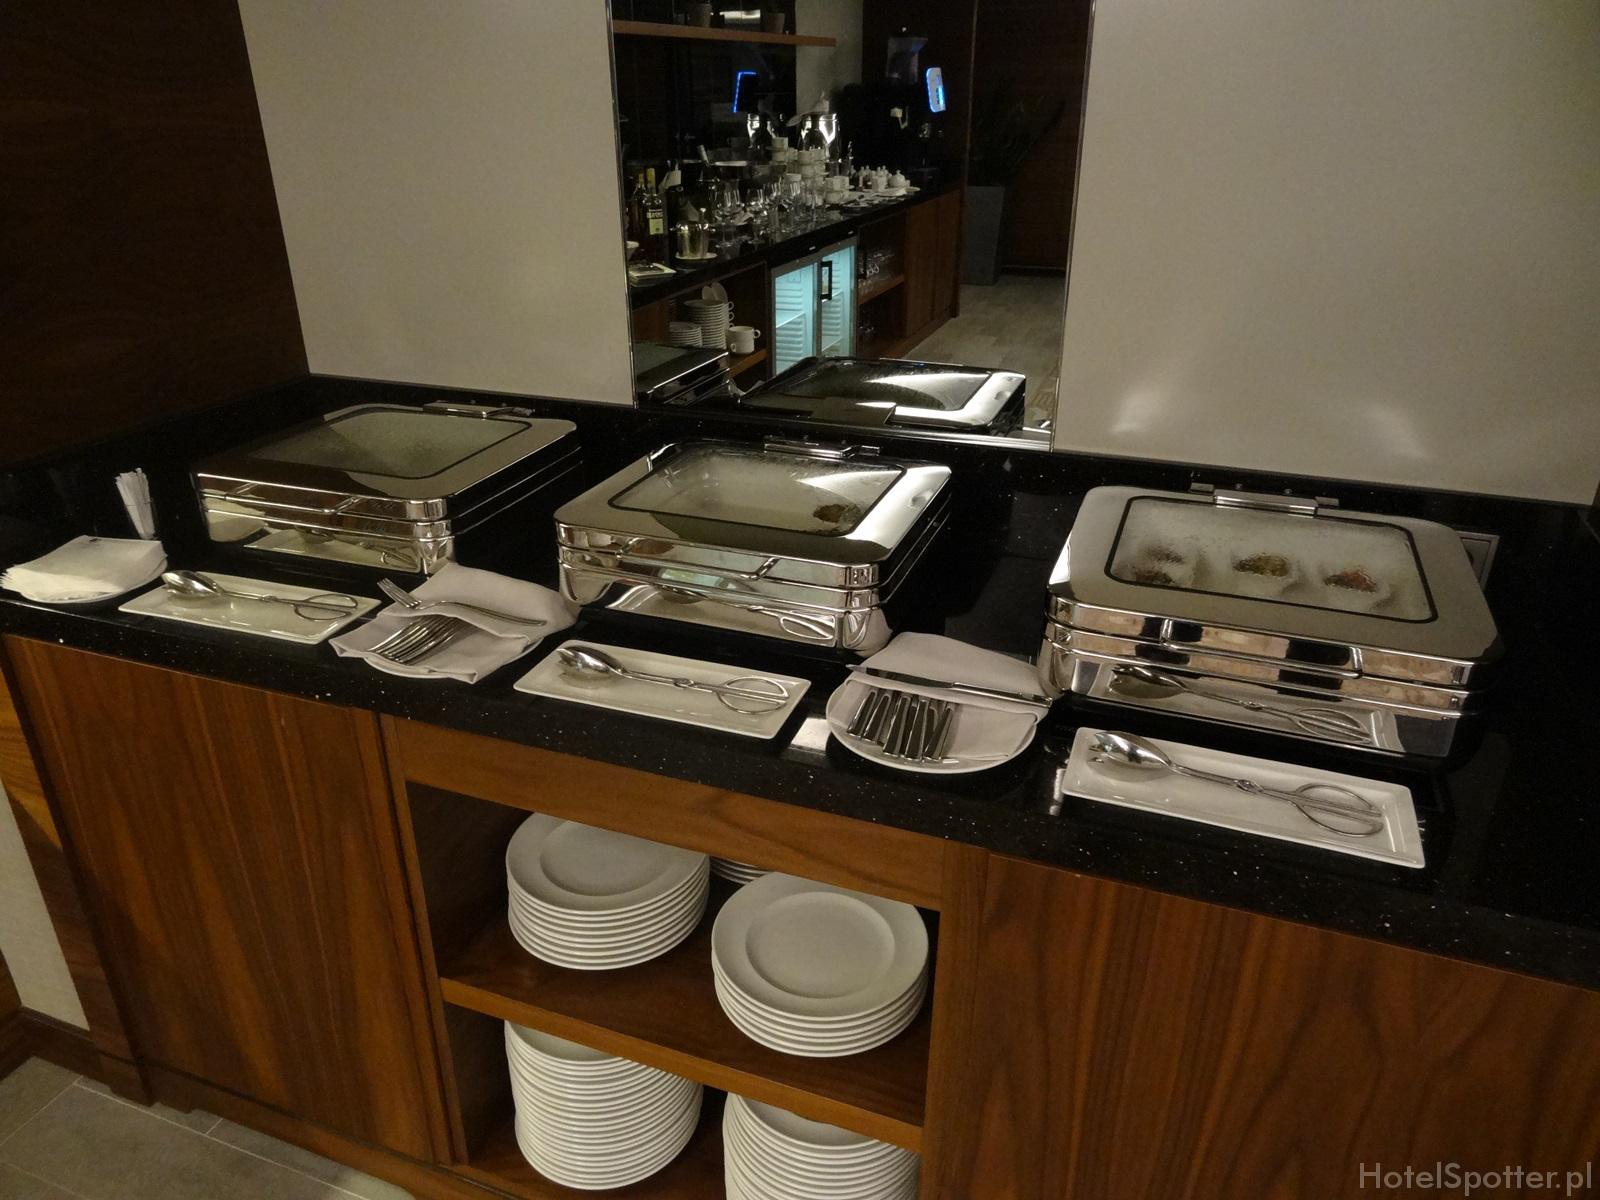 Salonik Executive Lounge w DoubleTree by Hilton Warsaw - dania na cieplo